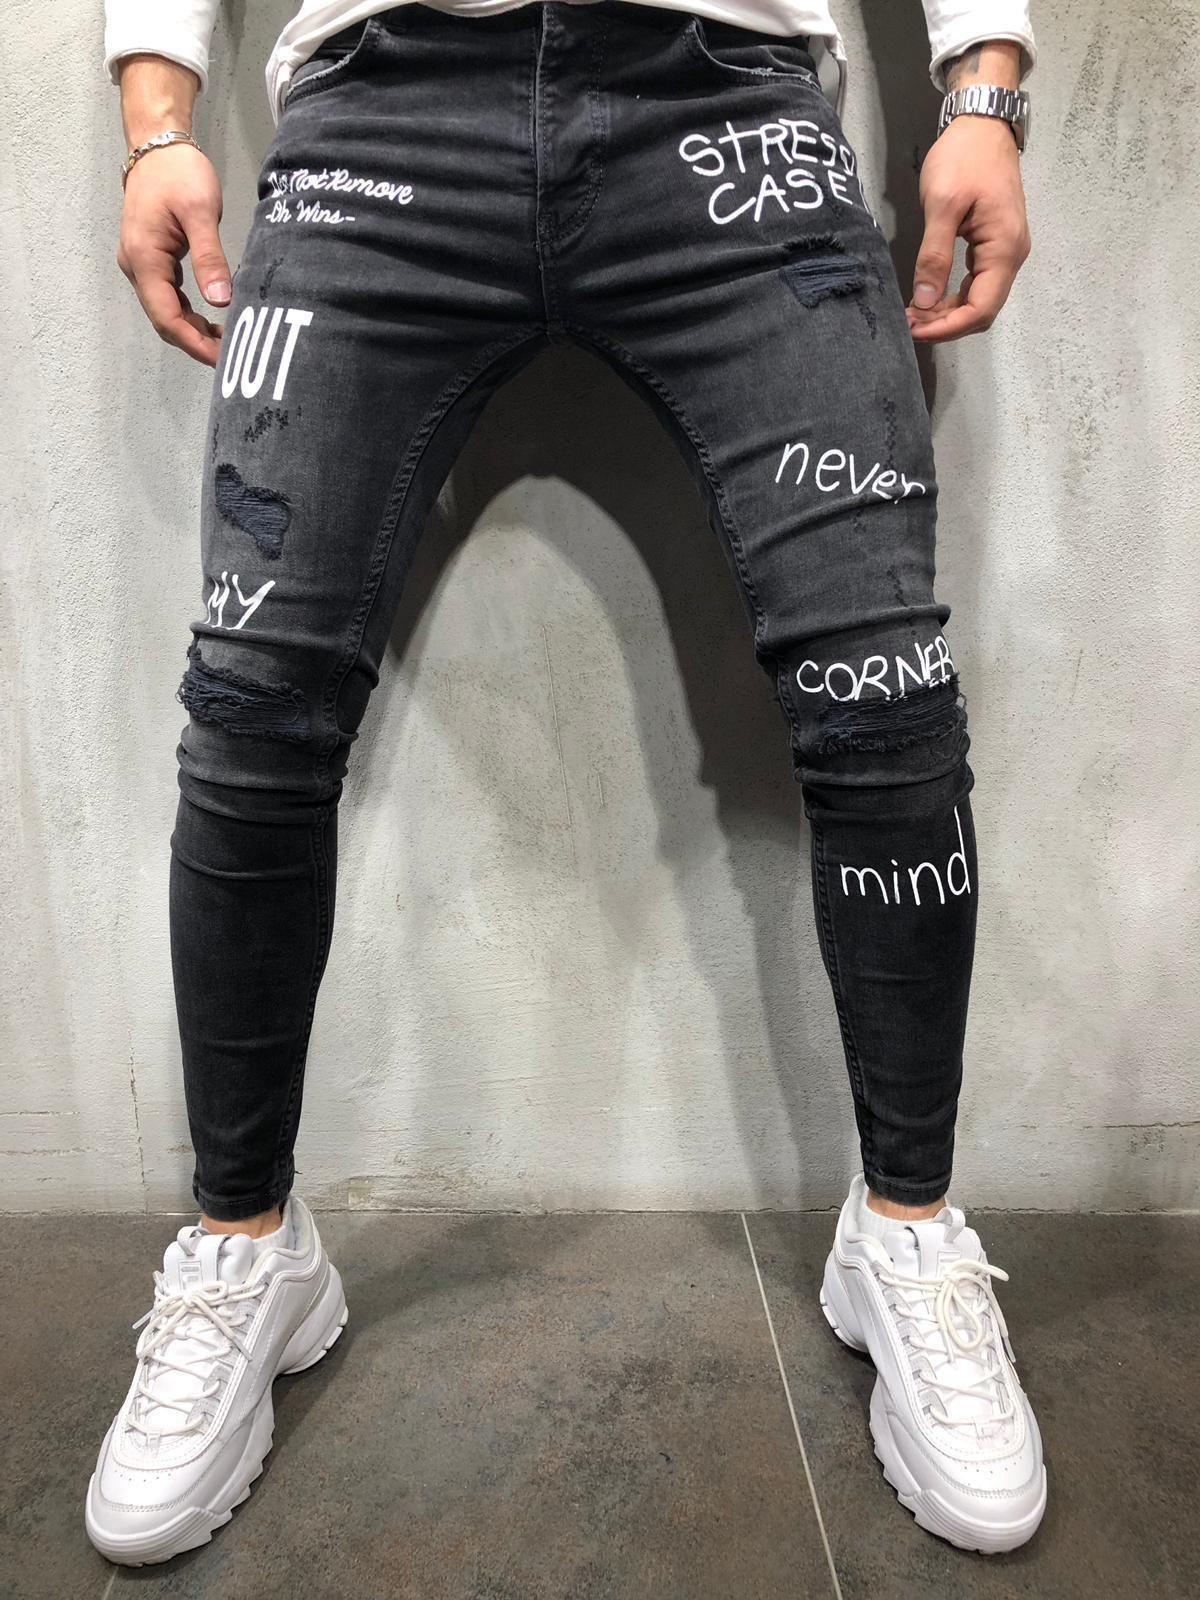 47e6b2eac Random Ripped Printed Jeans - Black in 2019 | Jeans | Streetwear ...